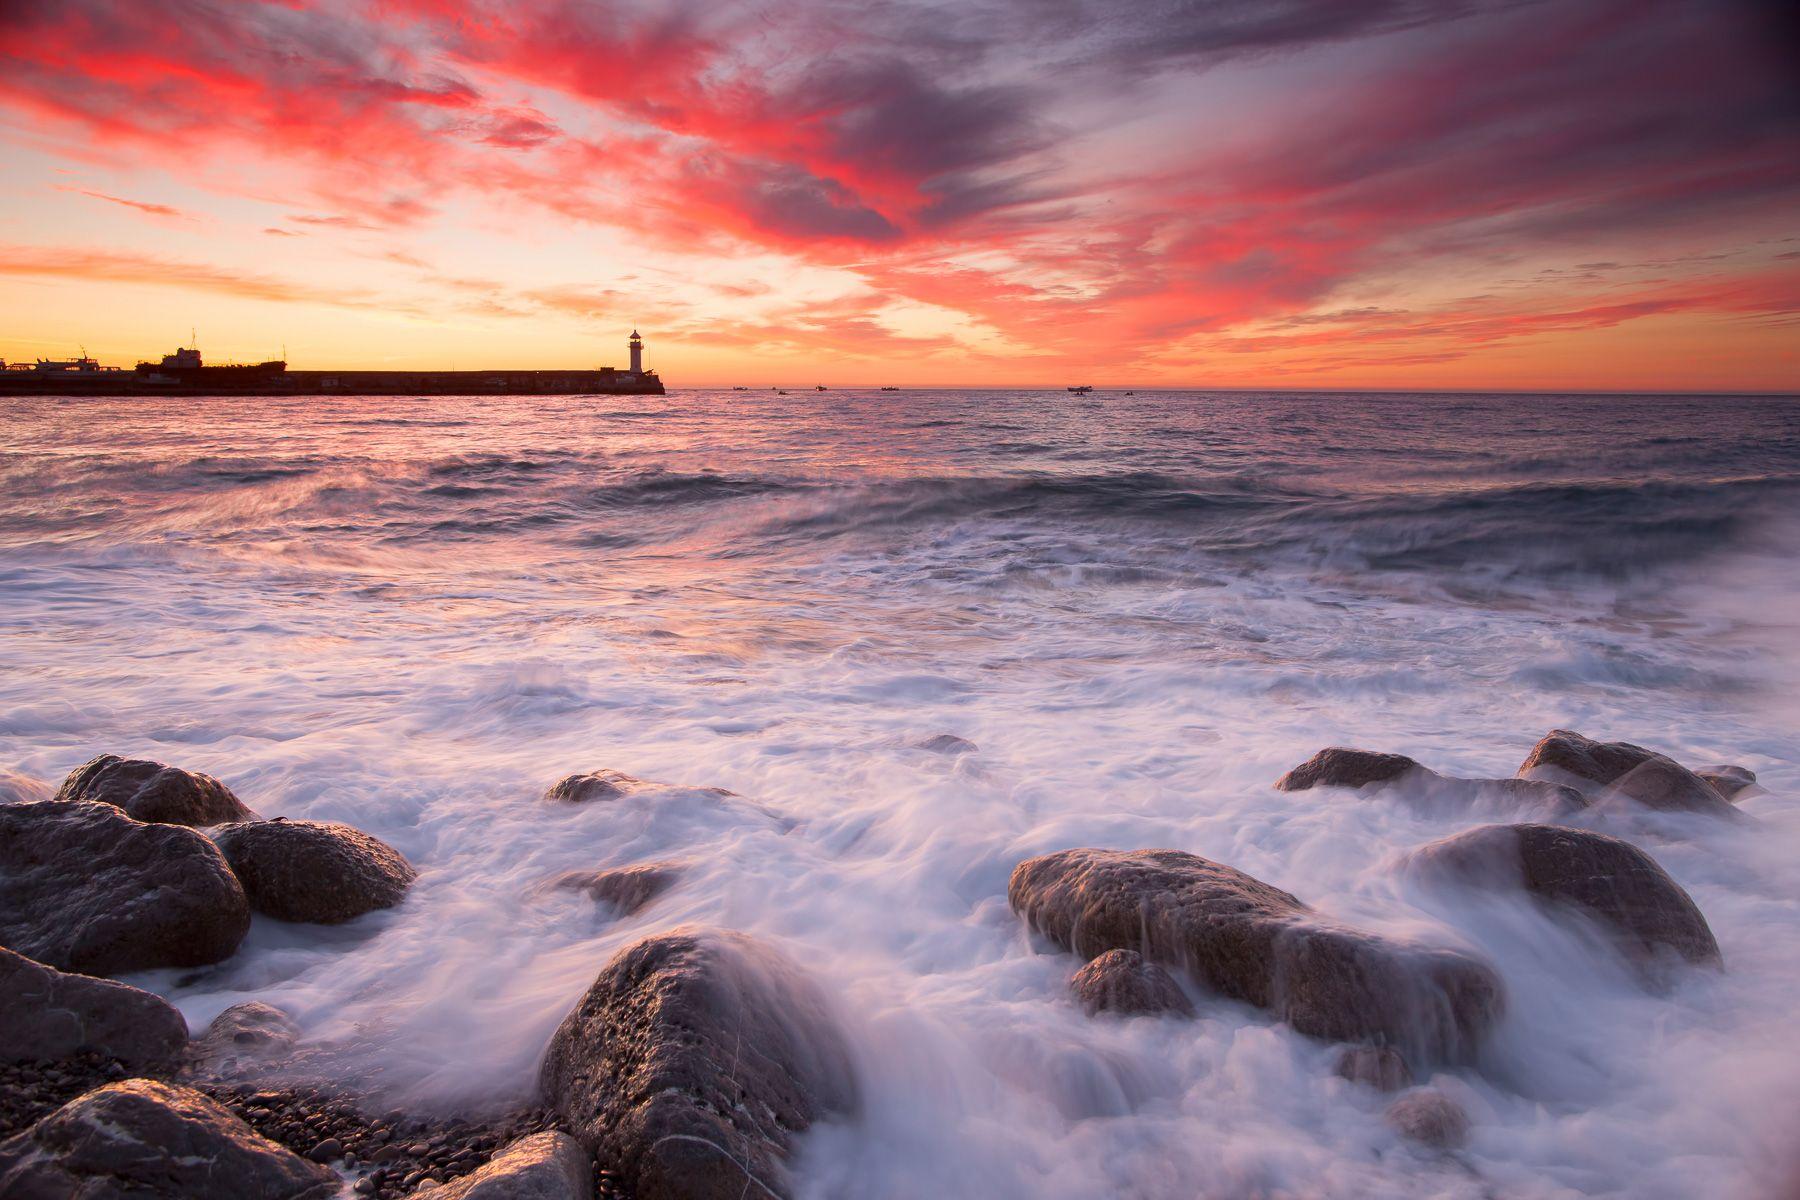 Ялтинский маяк Ялтинский маяк Ялта Крым Черное море залив фотограф